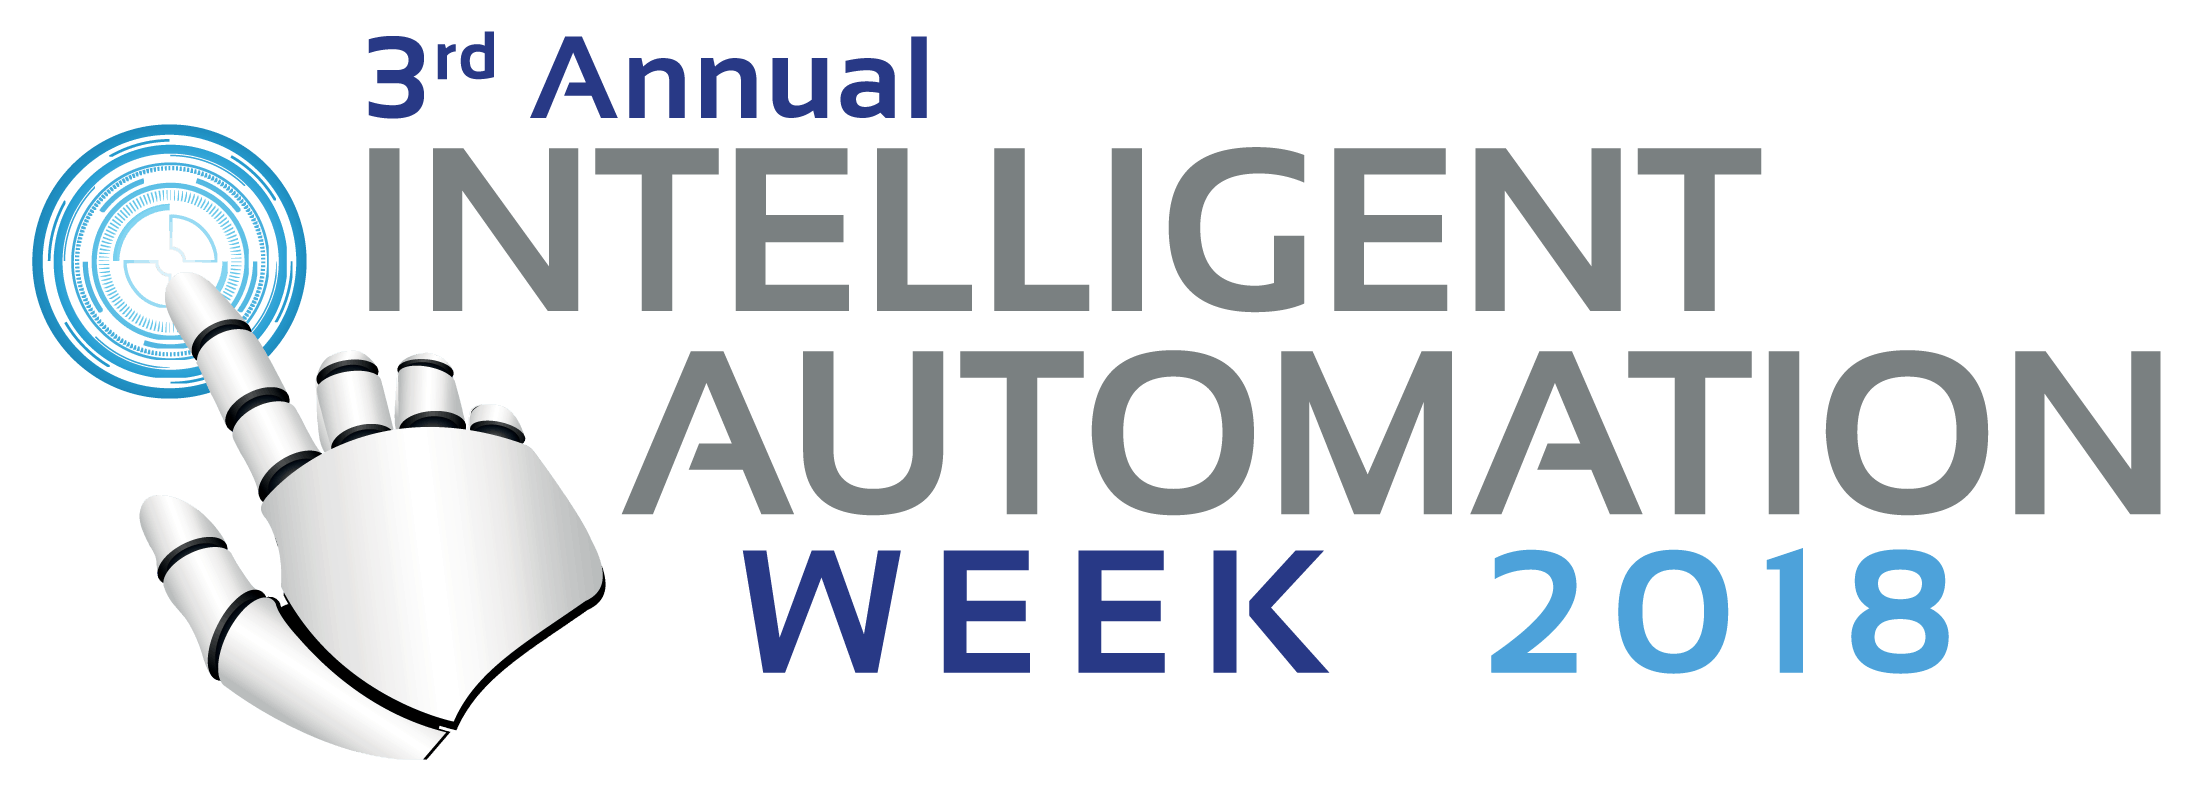 Intelligent Automation Week 2018 Logo